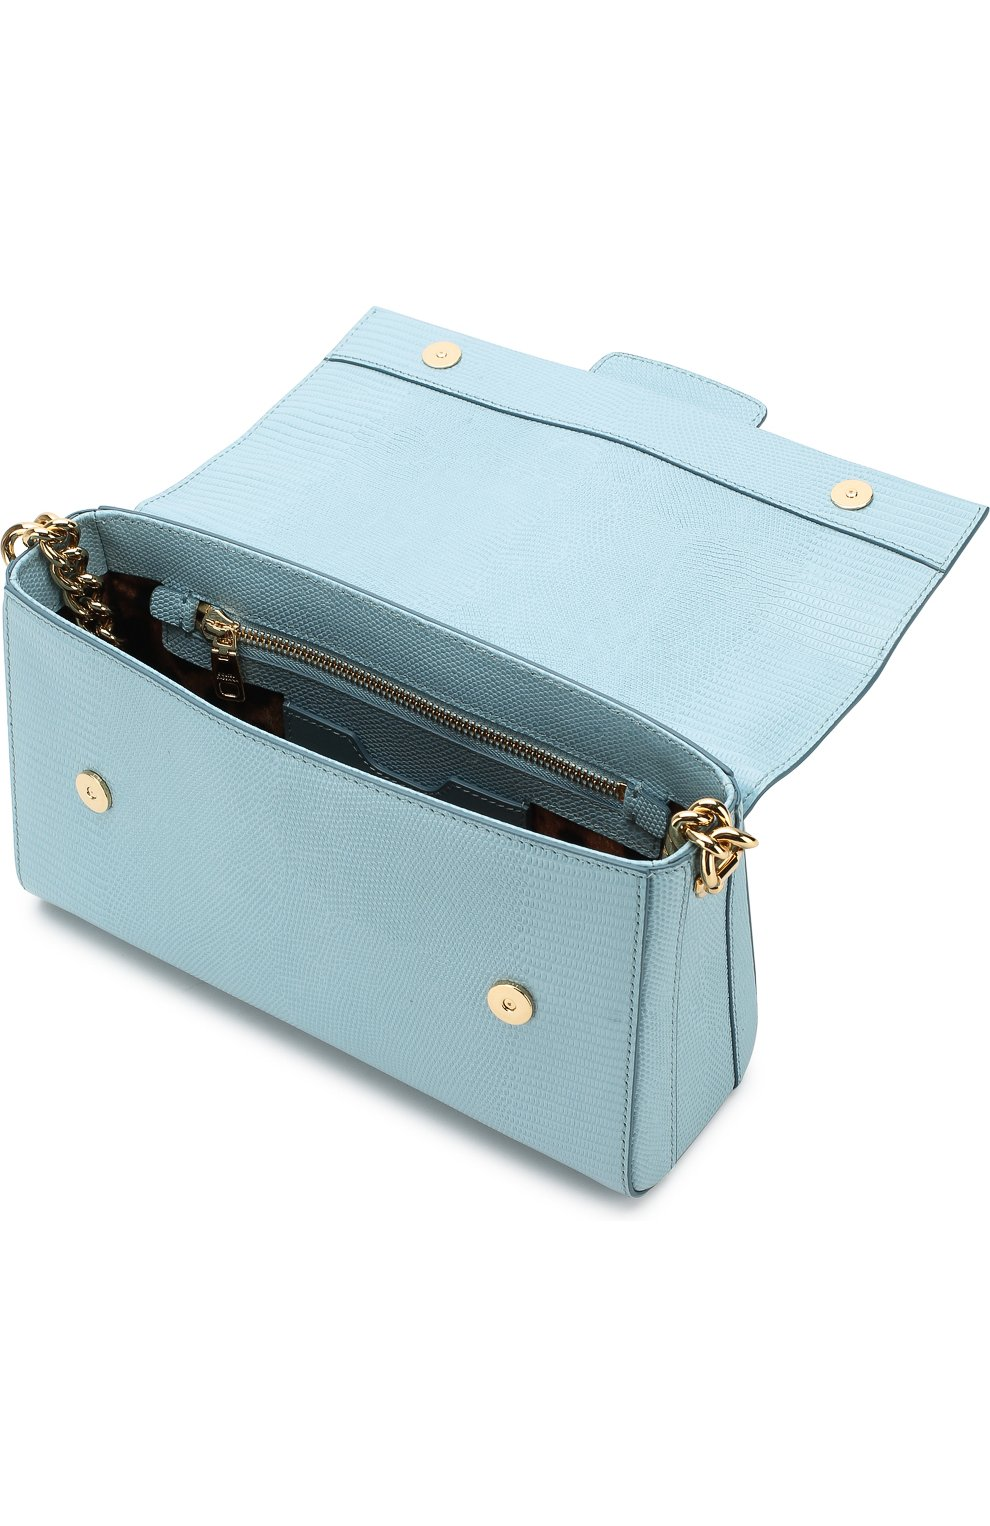 Сумка DG Millennials Dolce & Gabbana голубая цвета   Фото №4